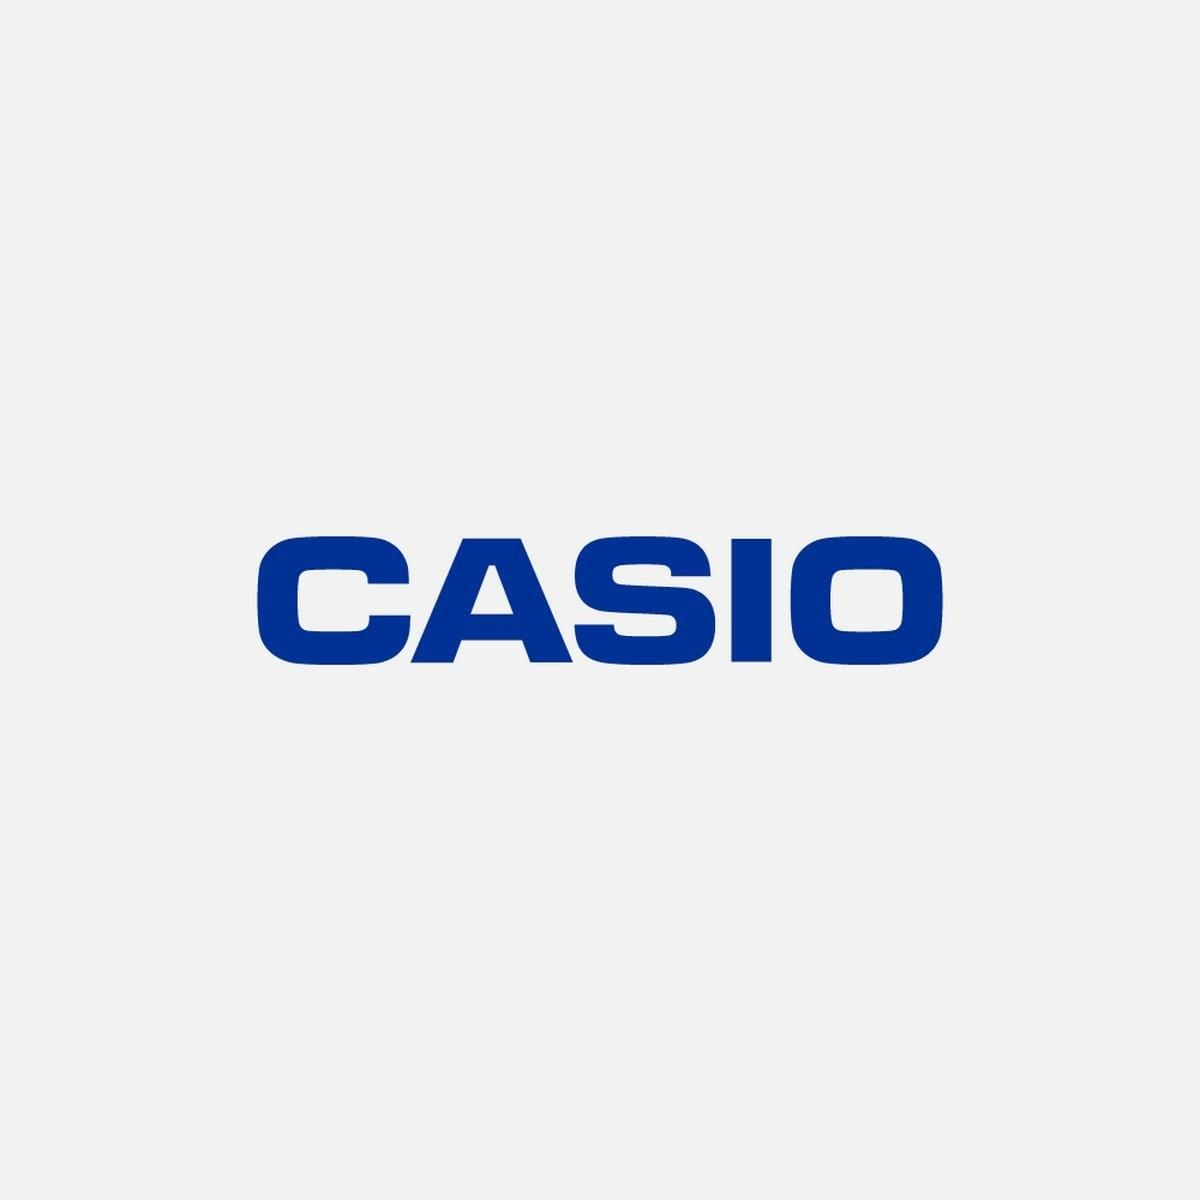 Marketing Mix Of Casio